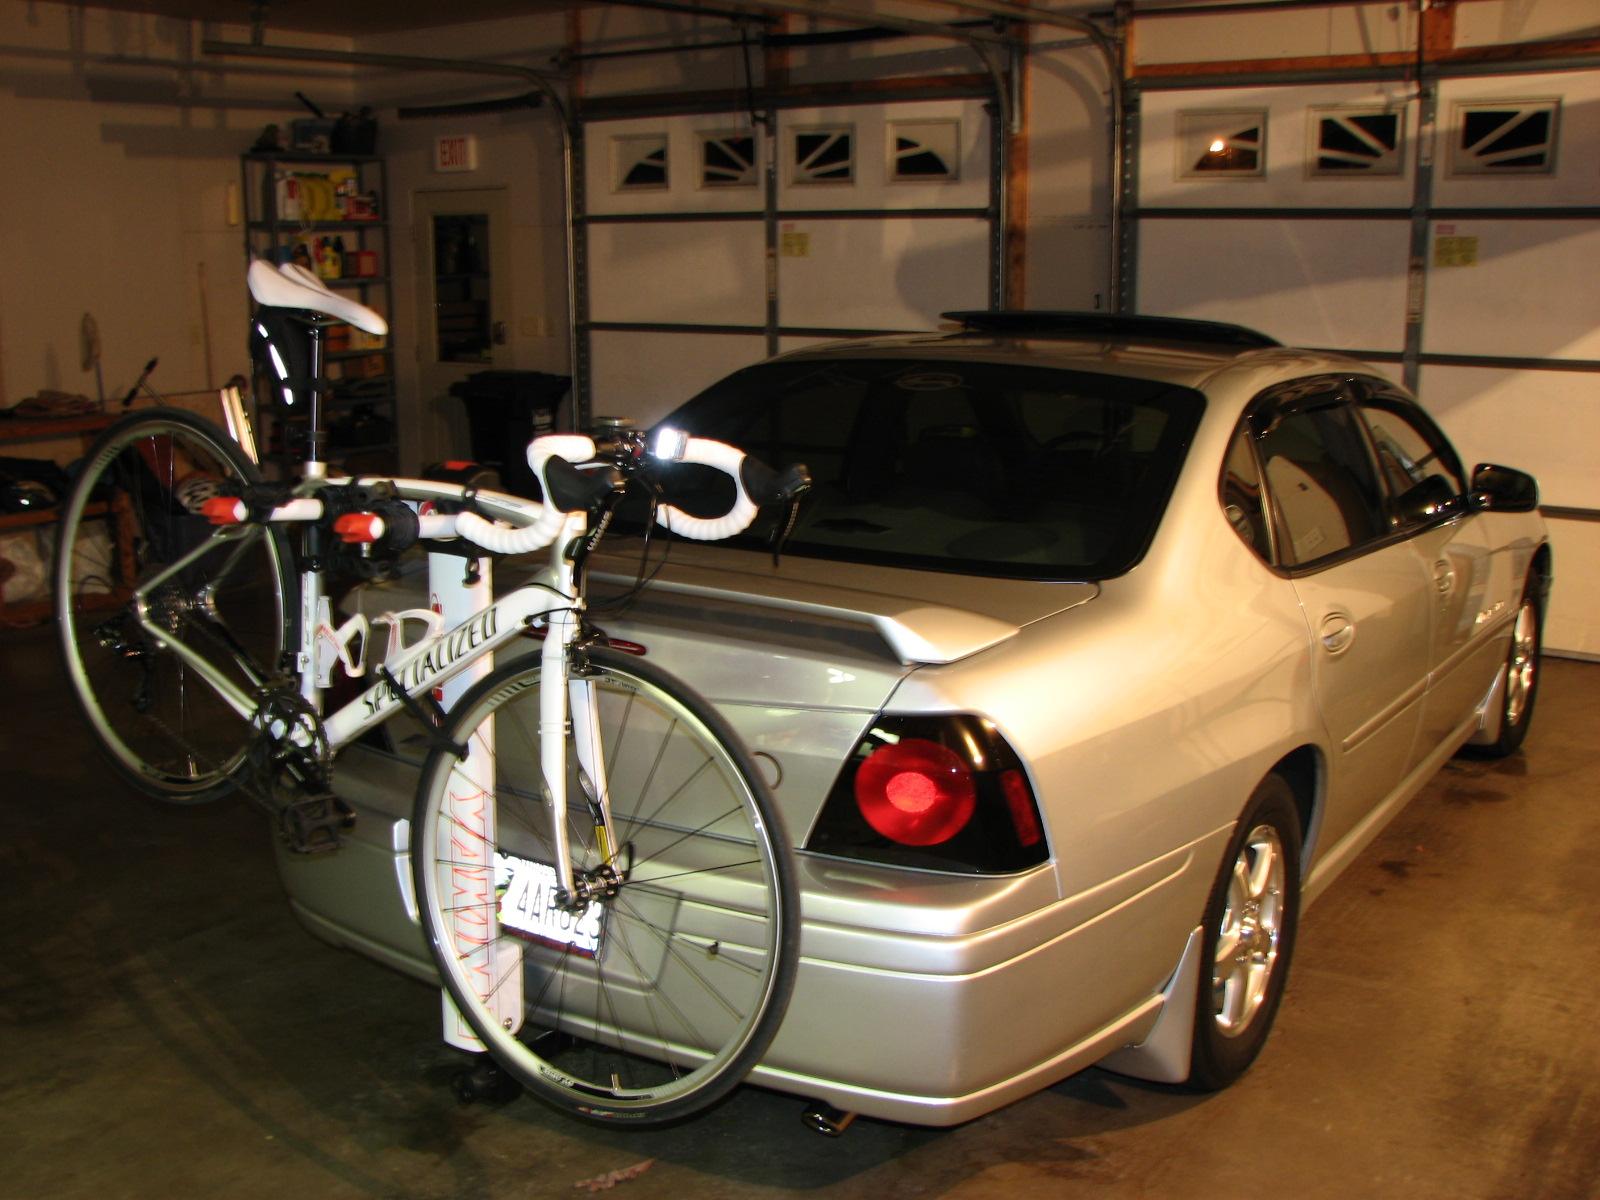 Bike rack for 7th gen 2005 Impala w/spoiler-bike-and-car2-003.jpg